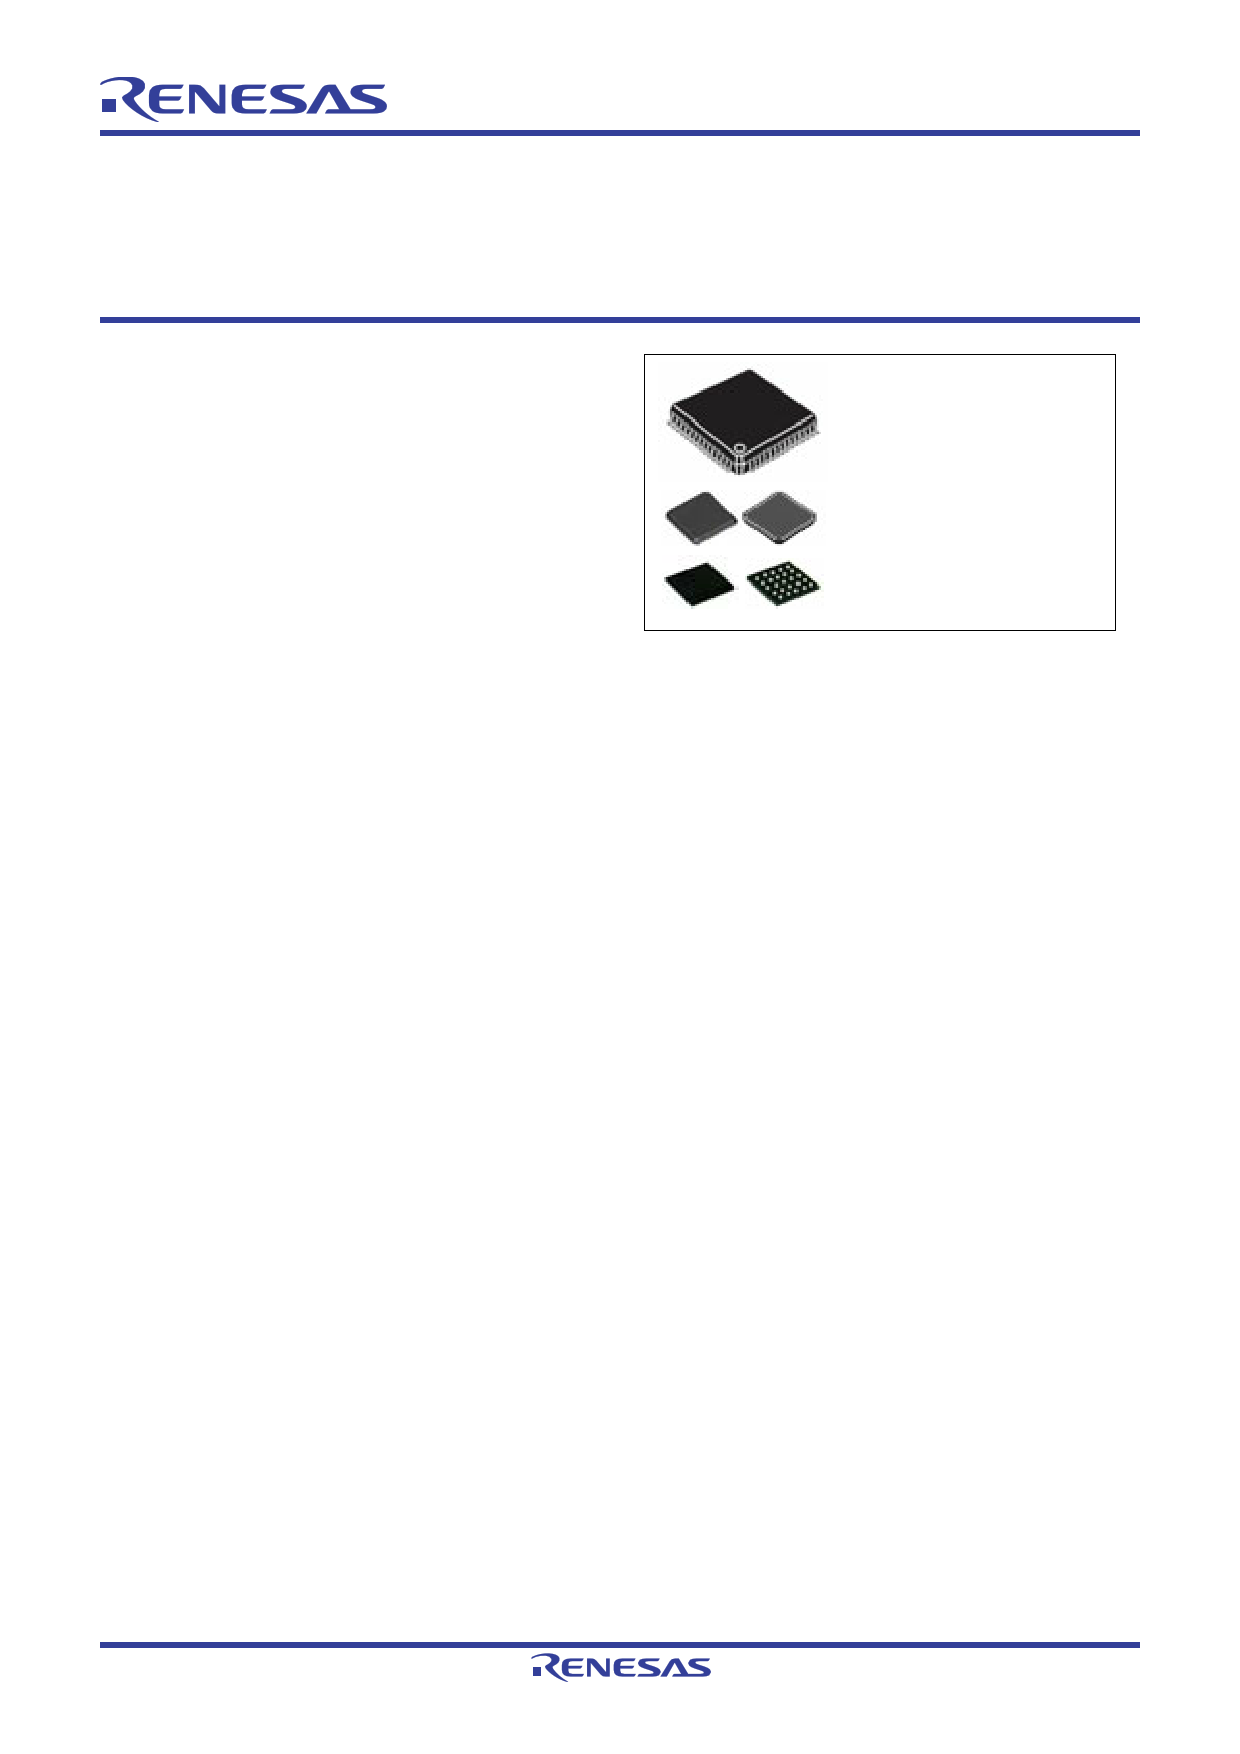 R5F51101AGFM 데이터시트 및 R5F51101AGFM PDF